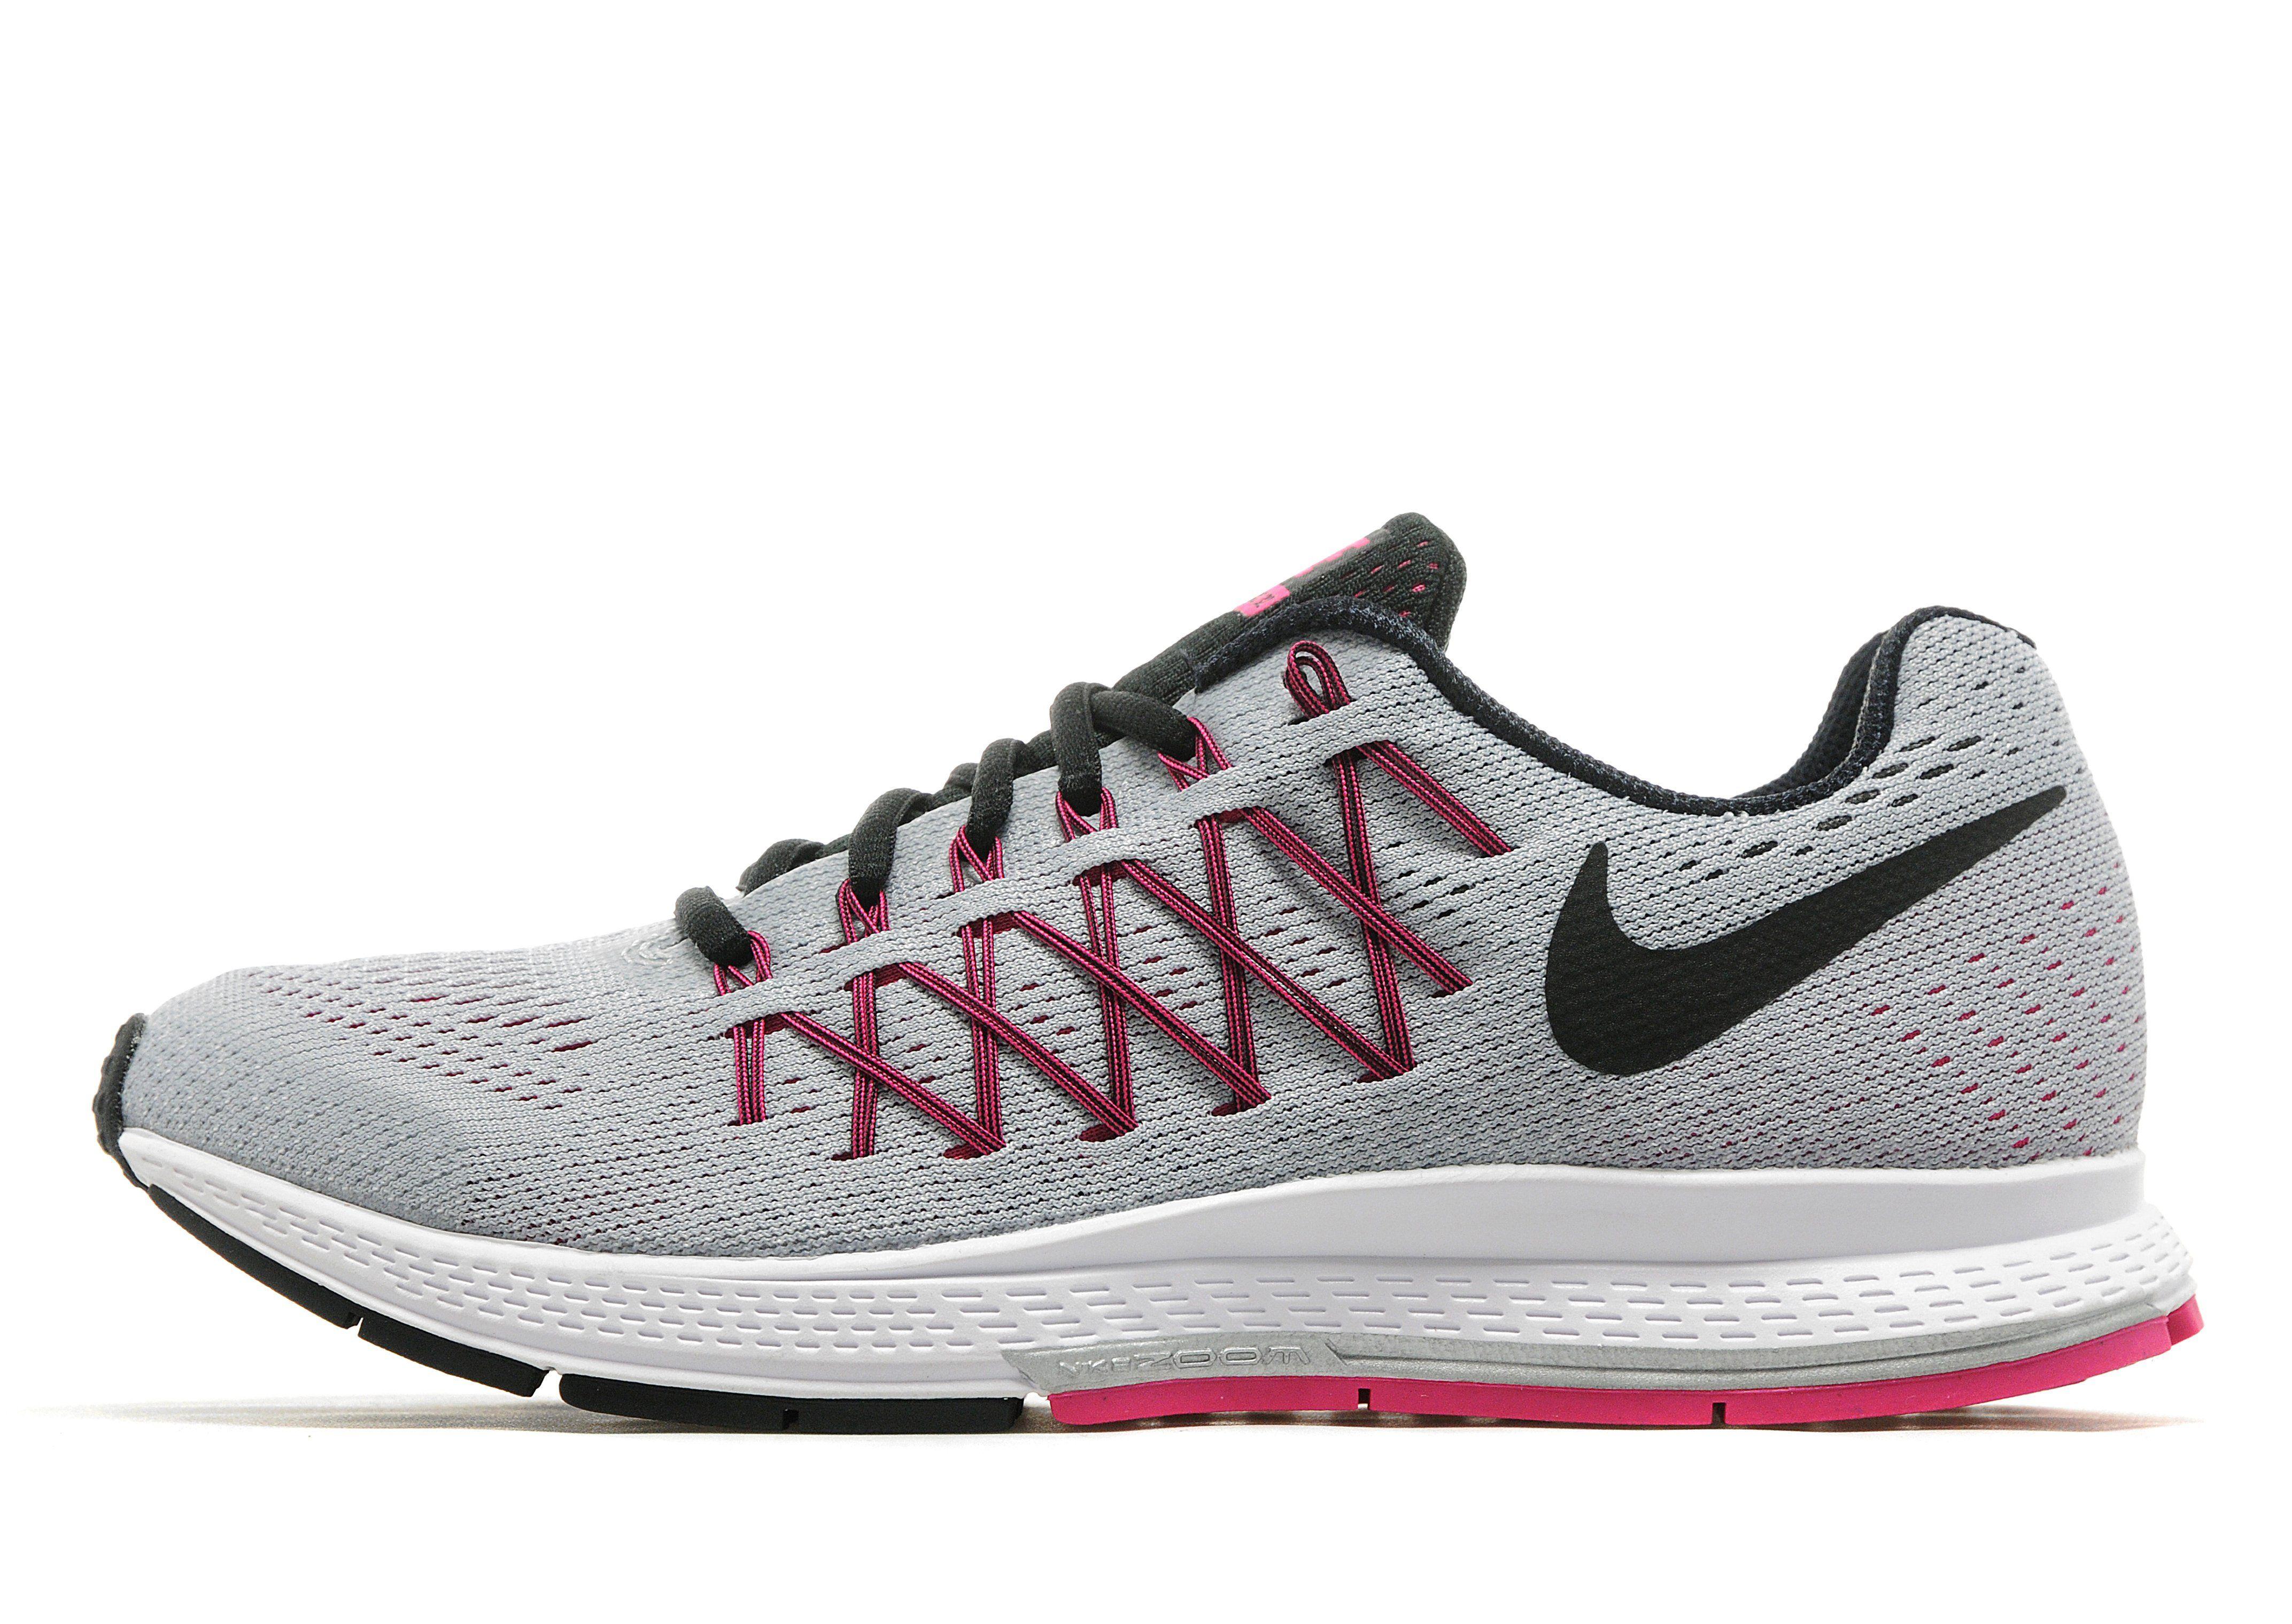 Nike Zoom Pegasus 32 Women's